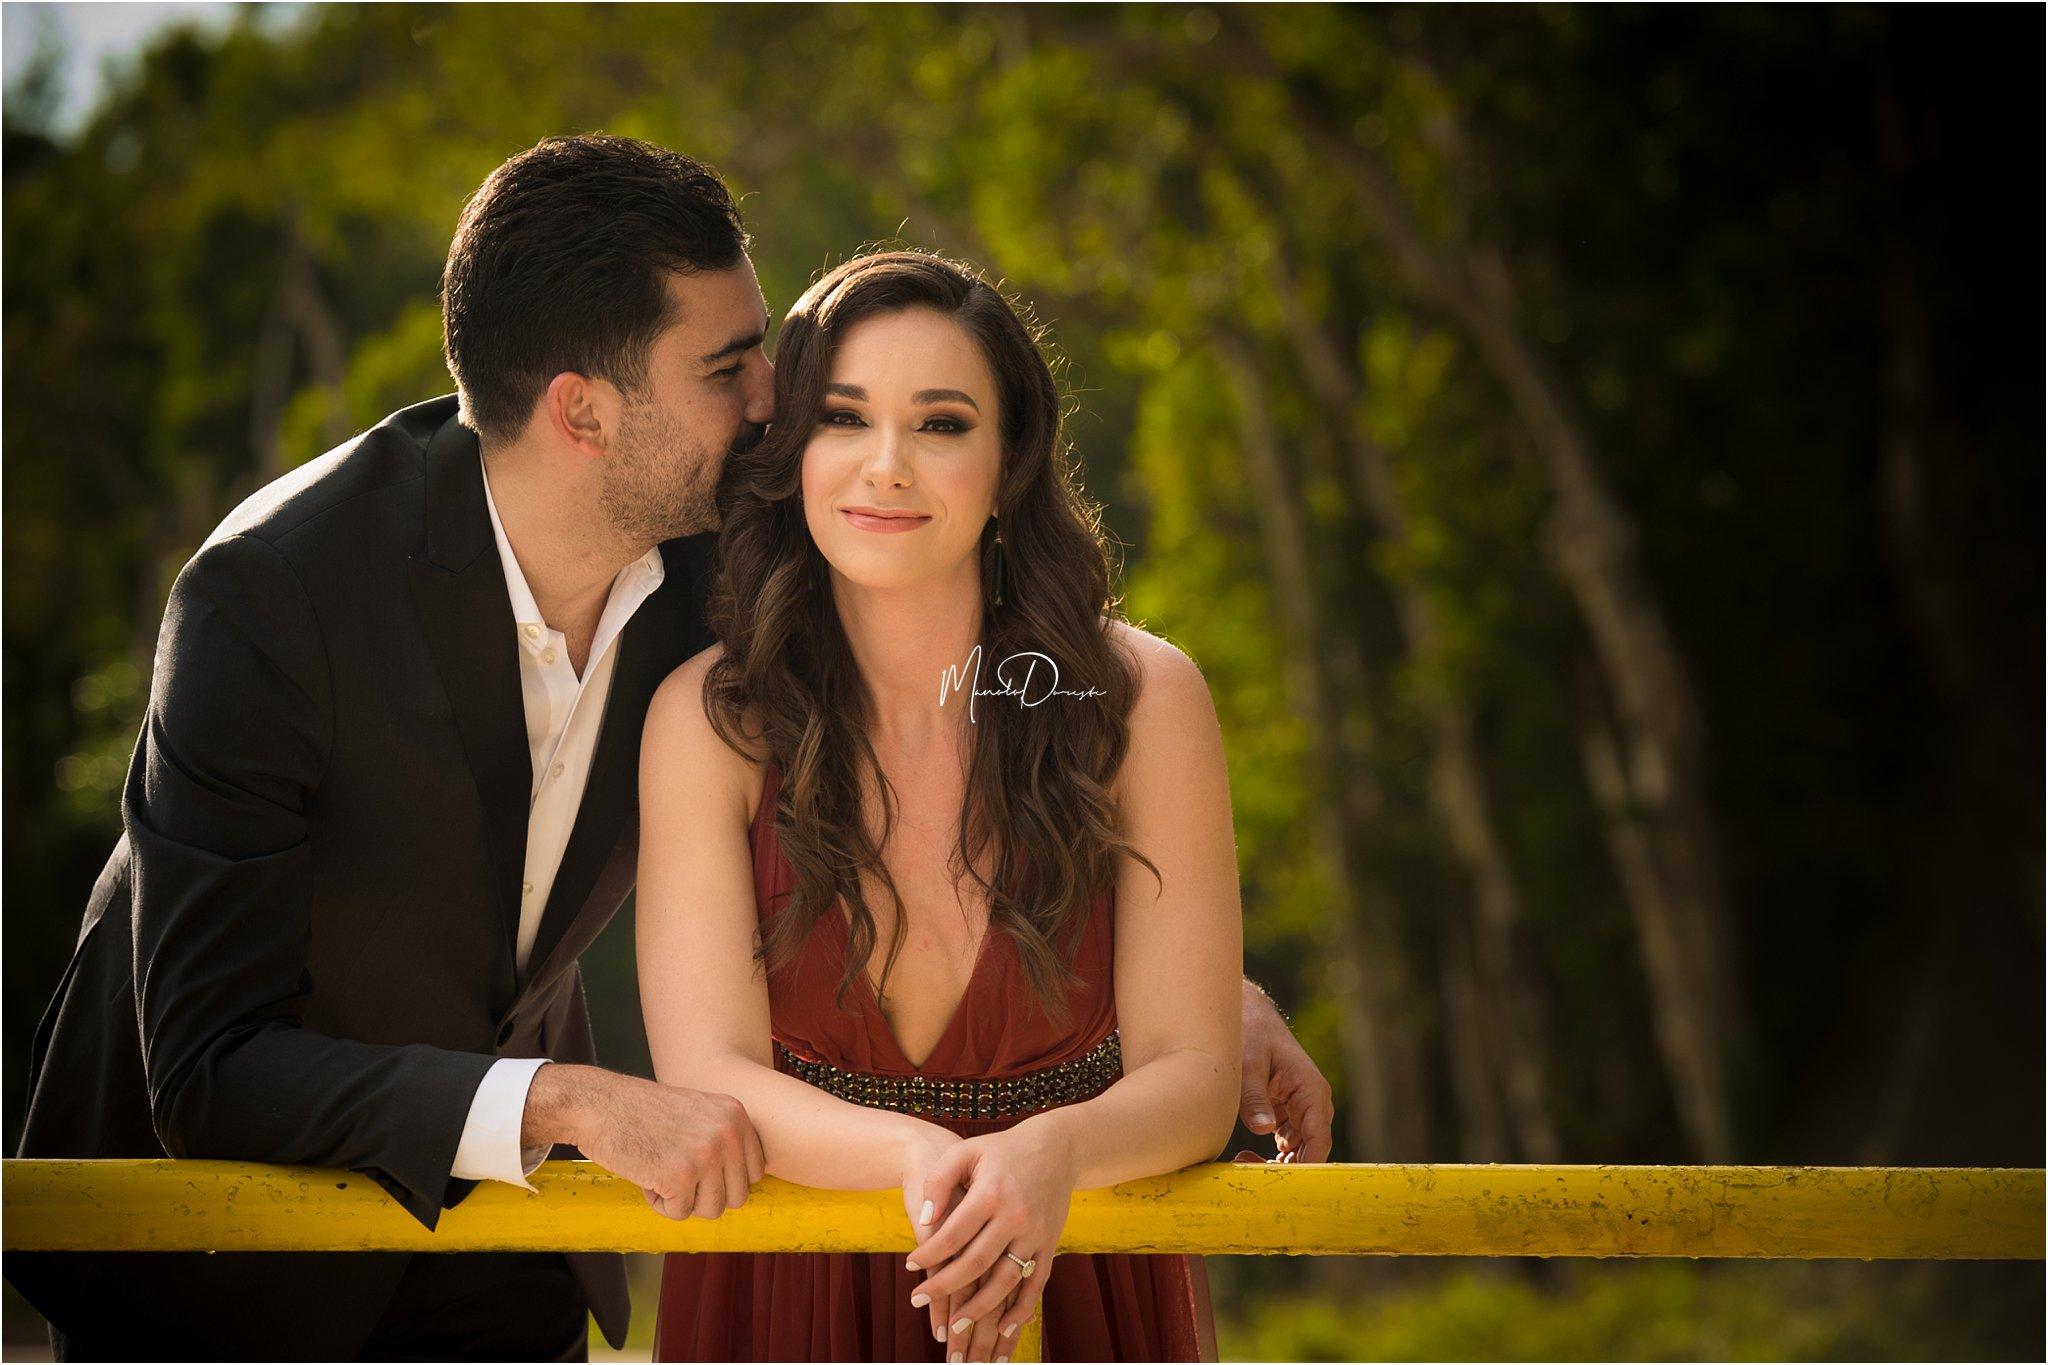 00814_ManoloDoreste_InFocusStudios_Wedding_Family_Photography_Miami_MiamiPhotographer.jpg